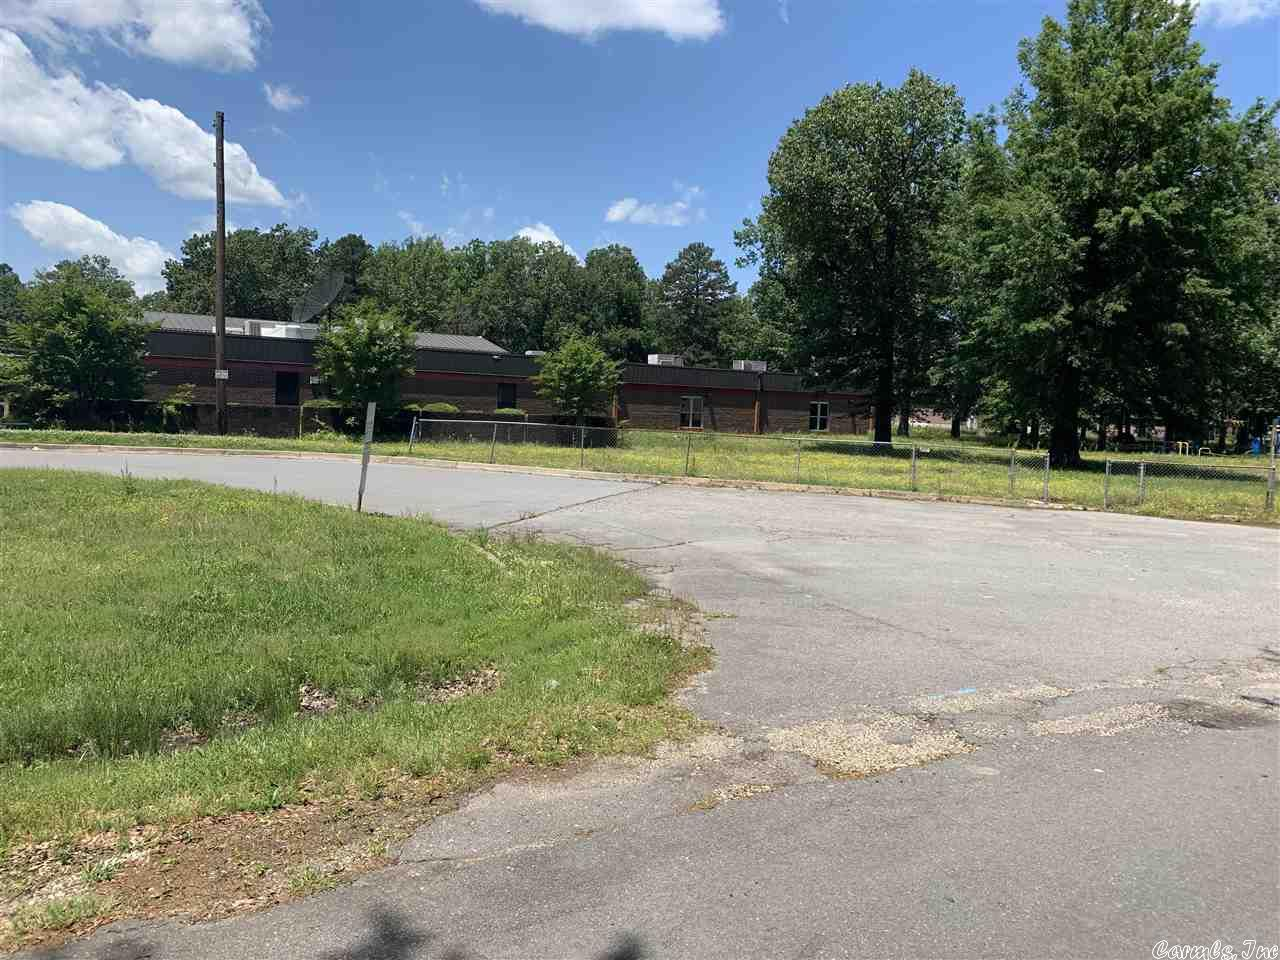 1519 INDIANA INDIANA STREET SCHOOL #No, Pine Bluff, AR 71603